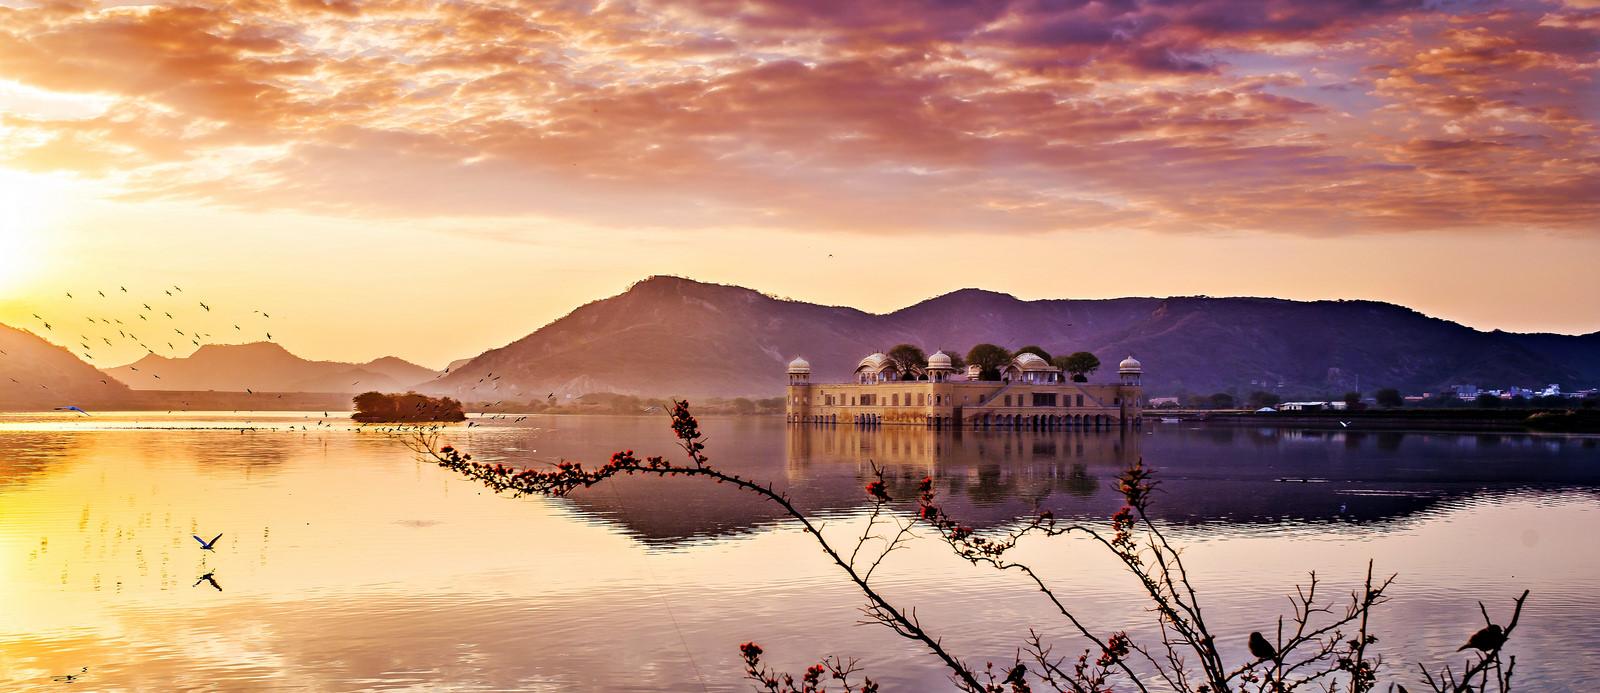 Jal Mahal at sunrise*